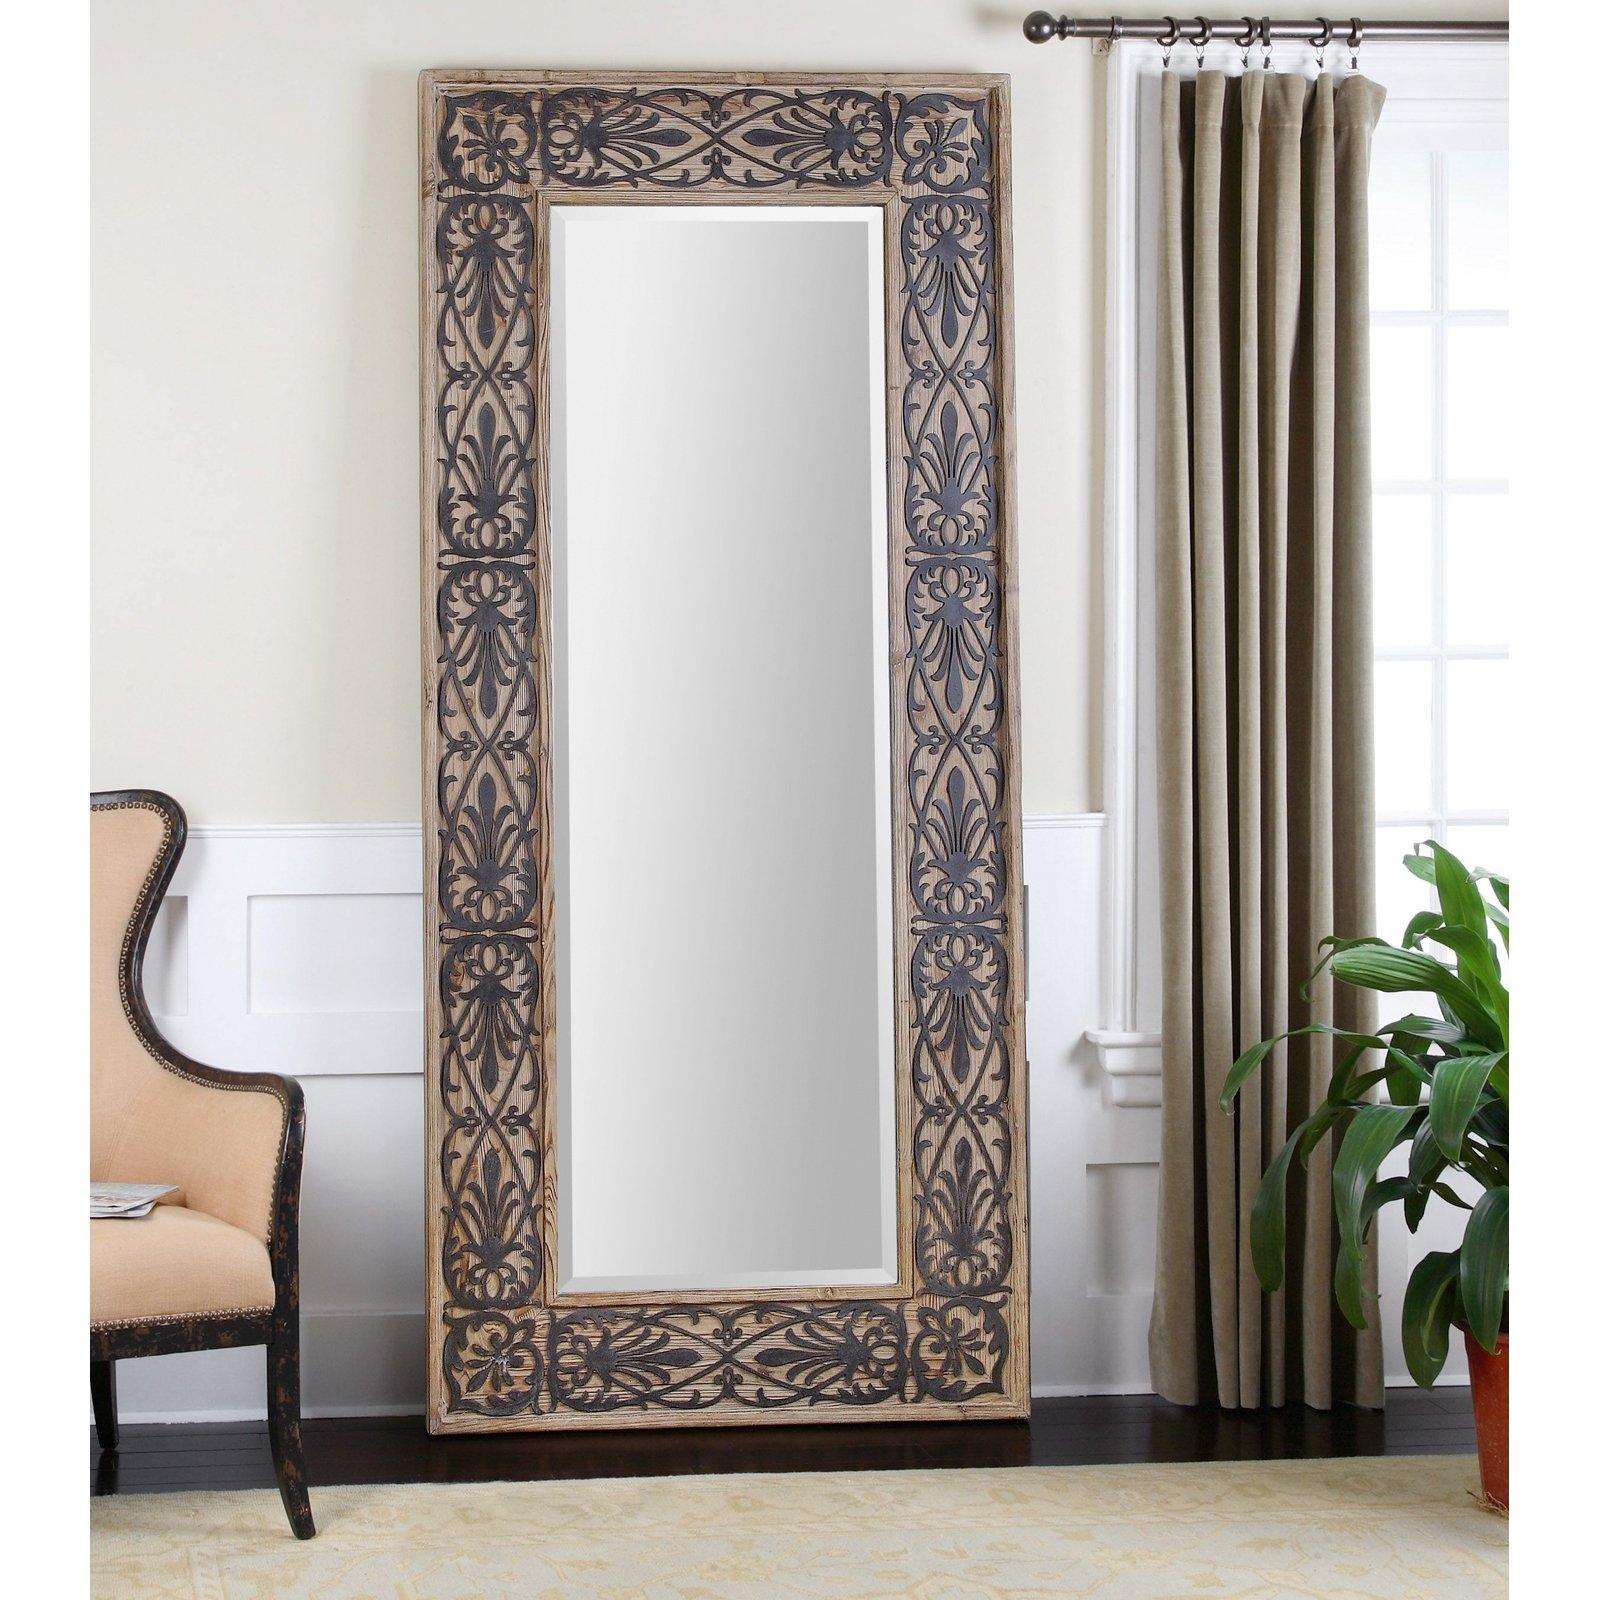 15 Ideas of Decorative Full Length Mirror | Mirror Ideas